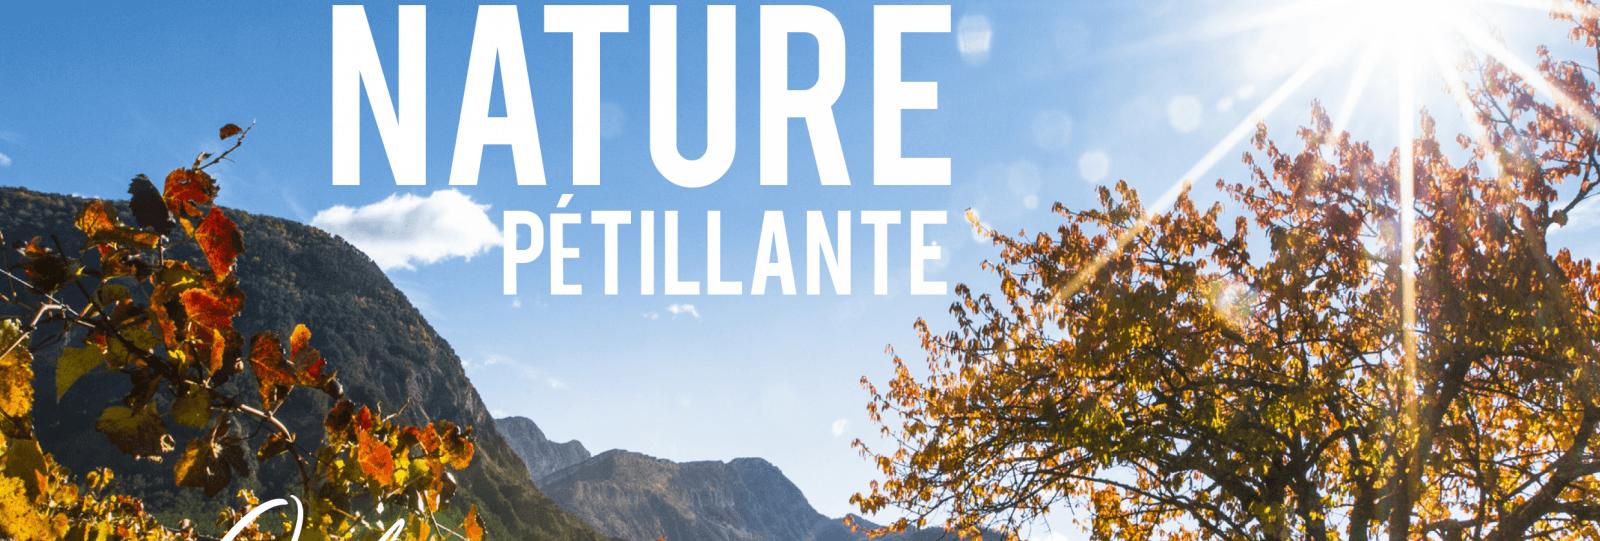 Journée groupes - Nature Pétillante